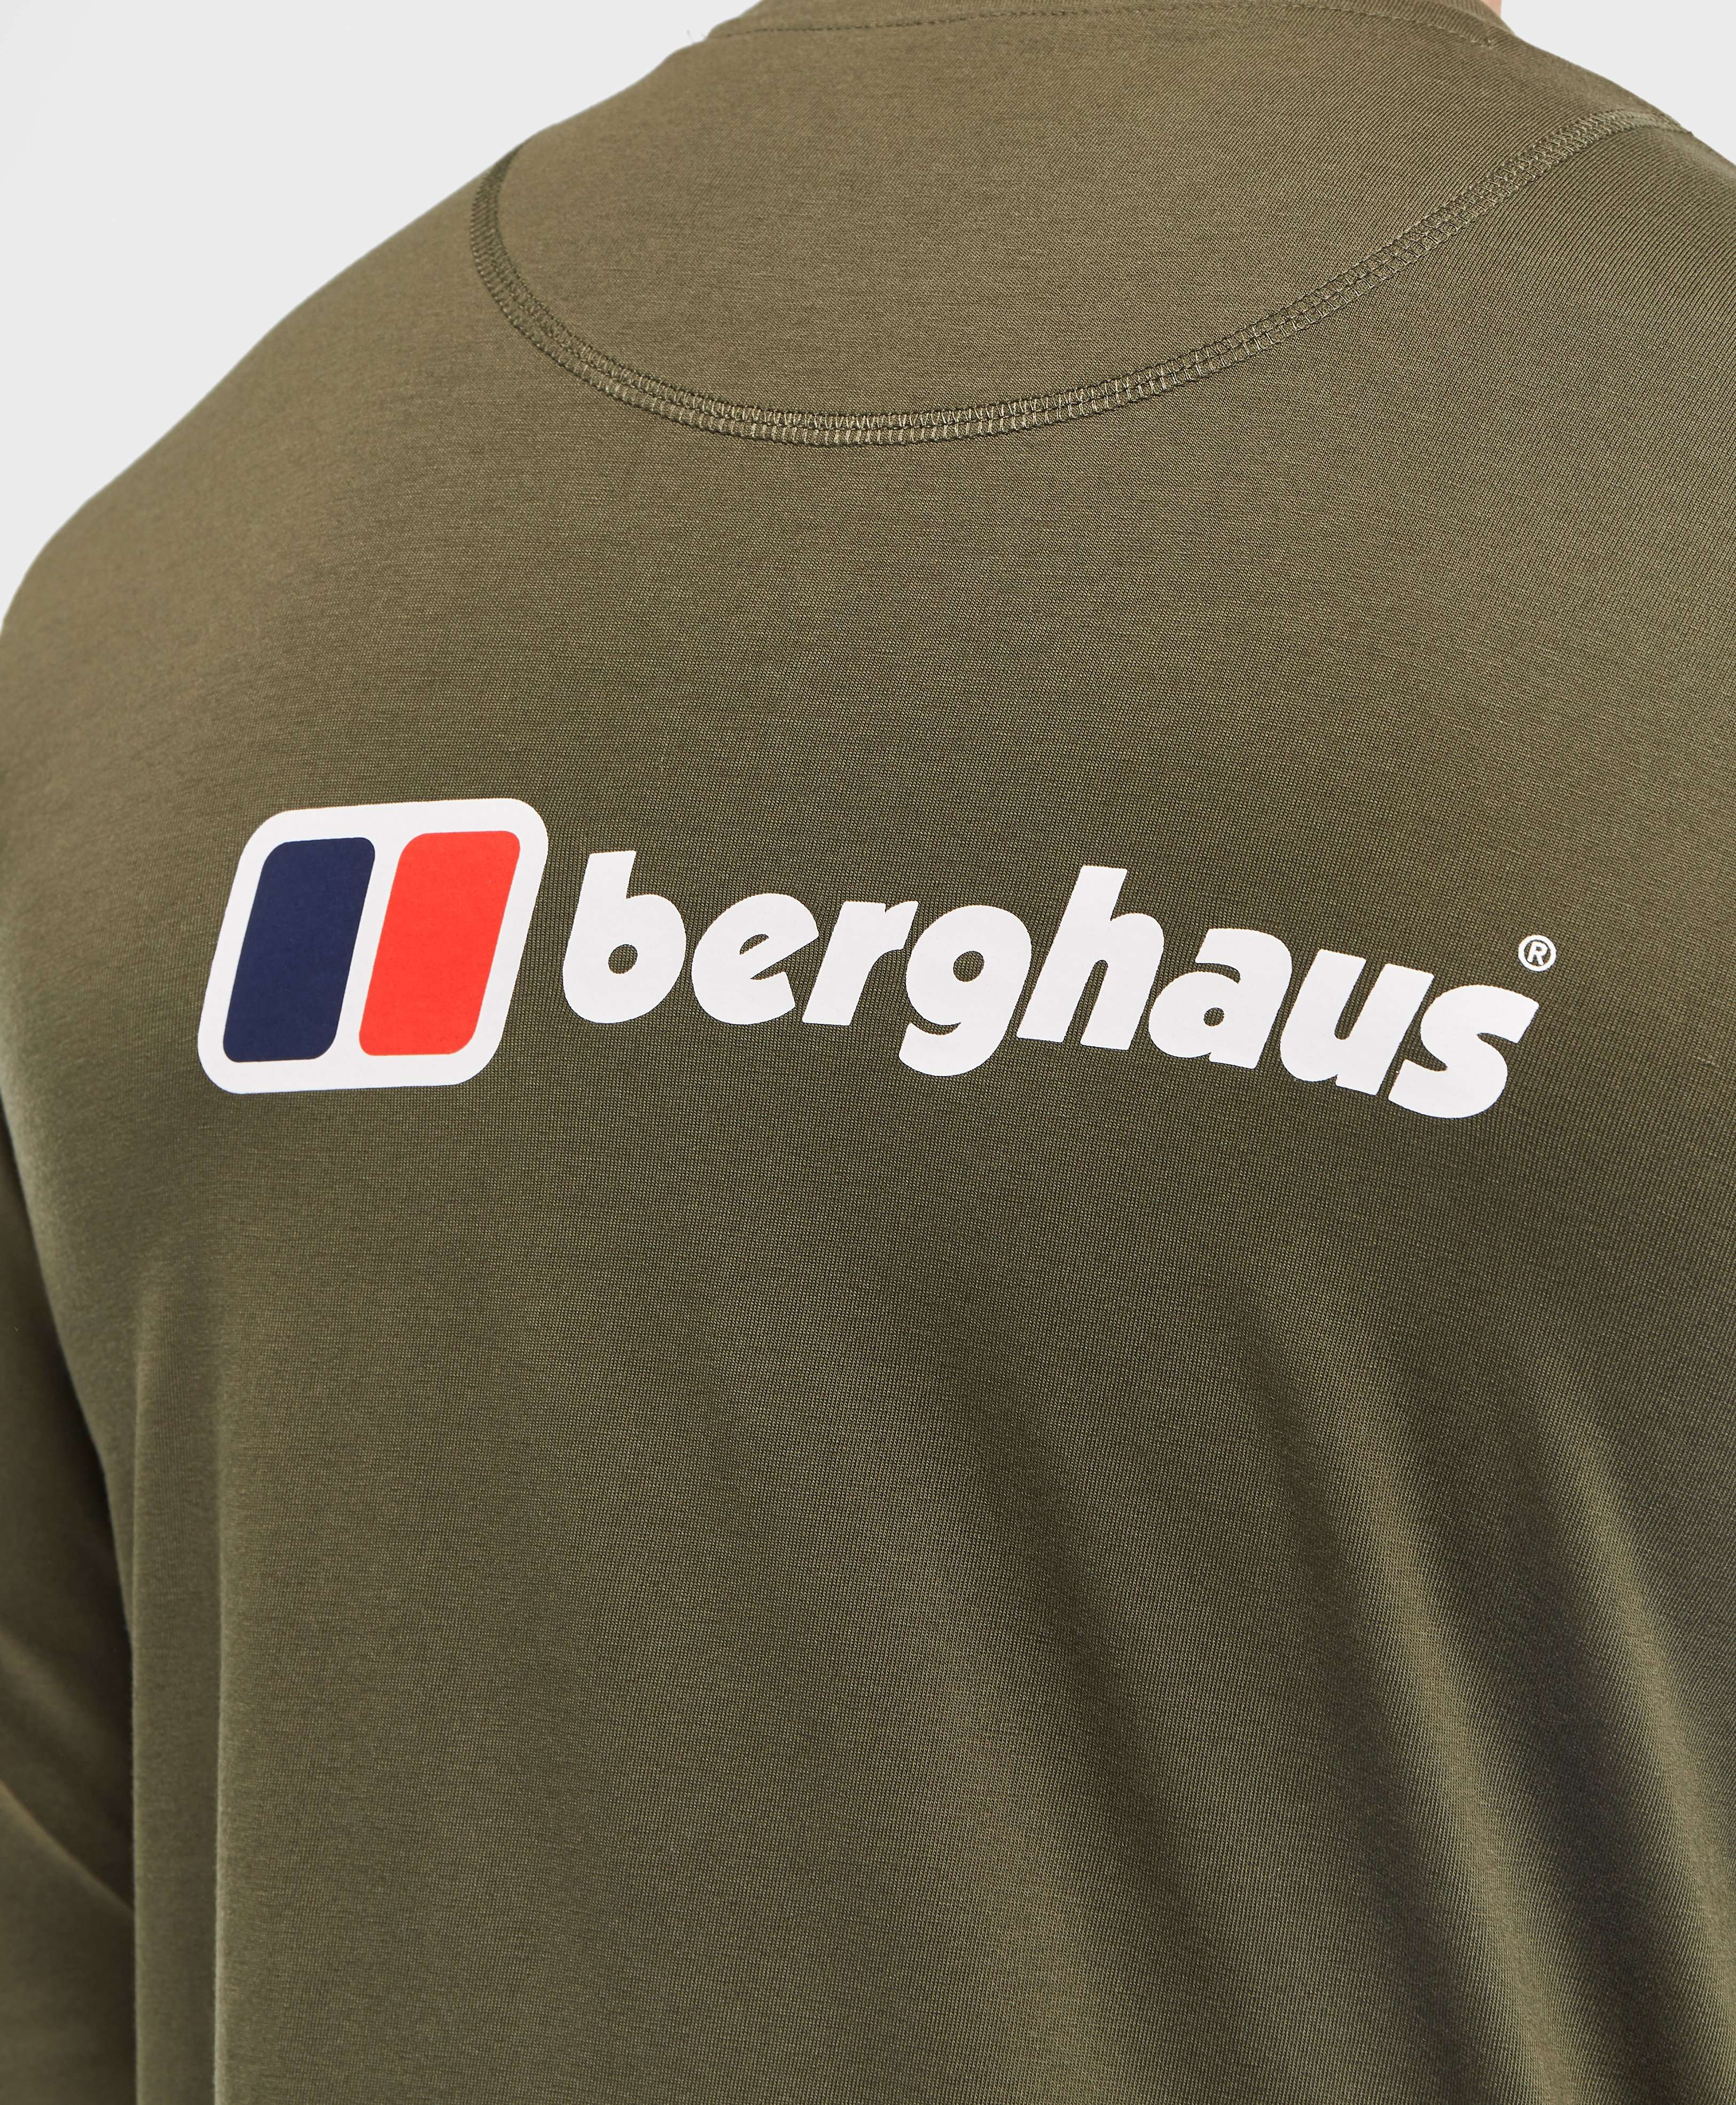 Berghaus Back Print Long Sleeve T-Shirt - Online Exclusive